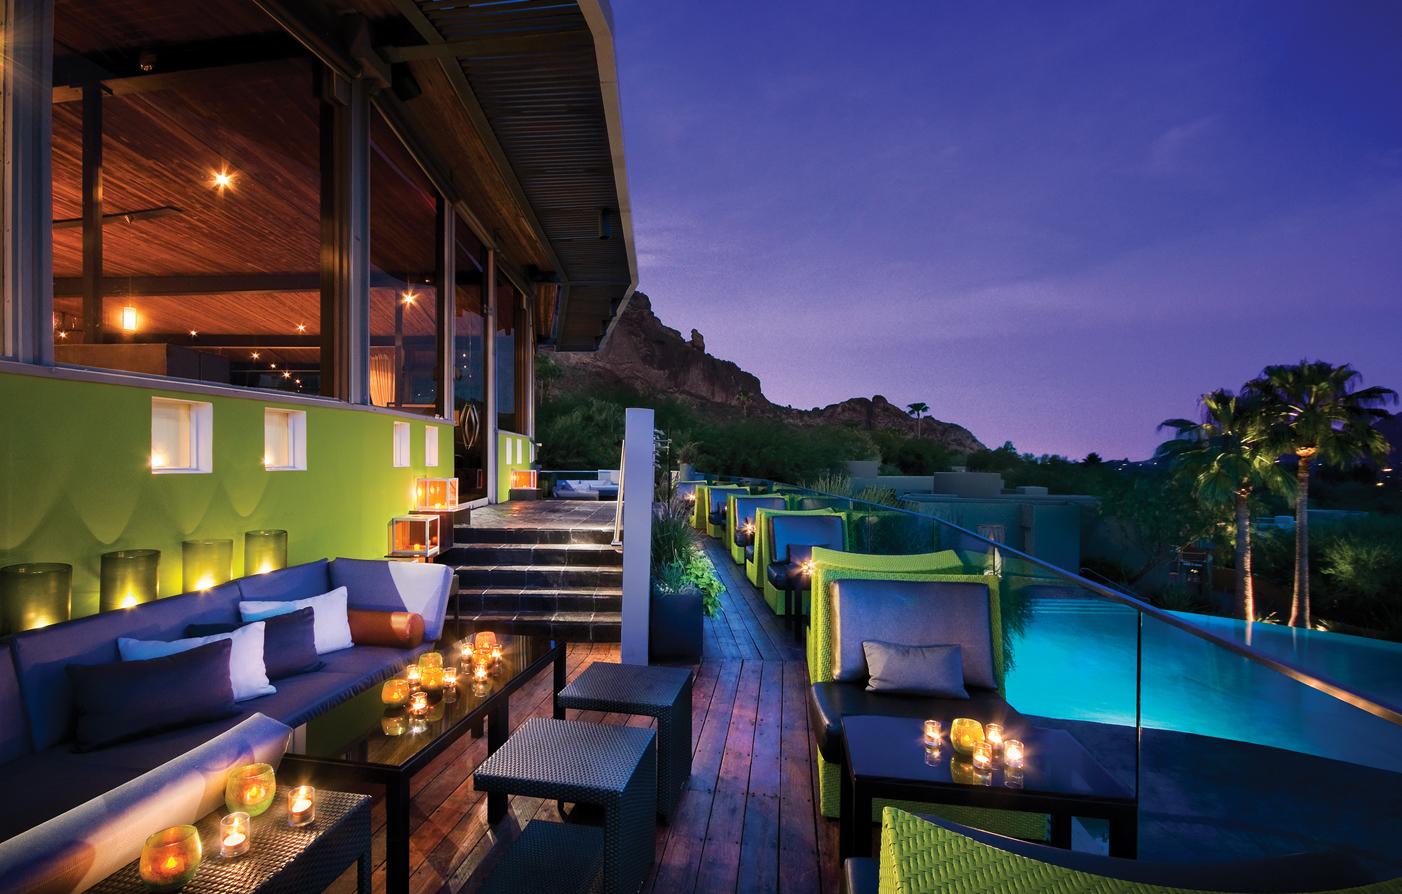 sanctuary camelback mountain resort & spa | luxury hotel in scottsdale